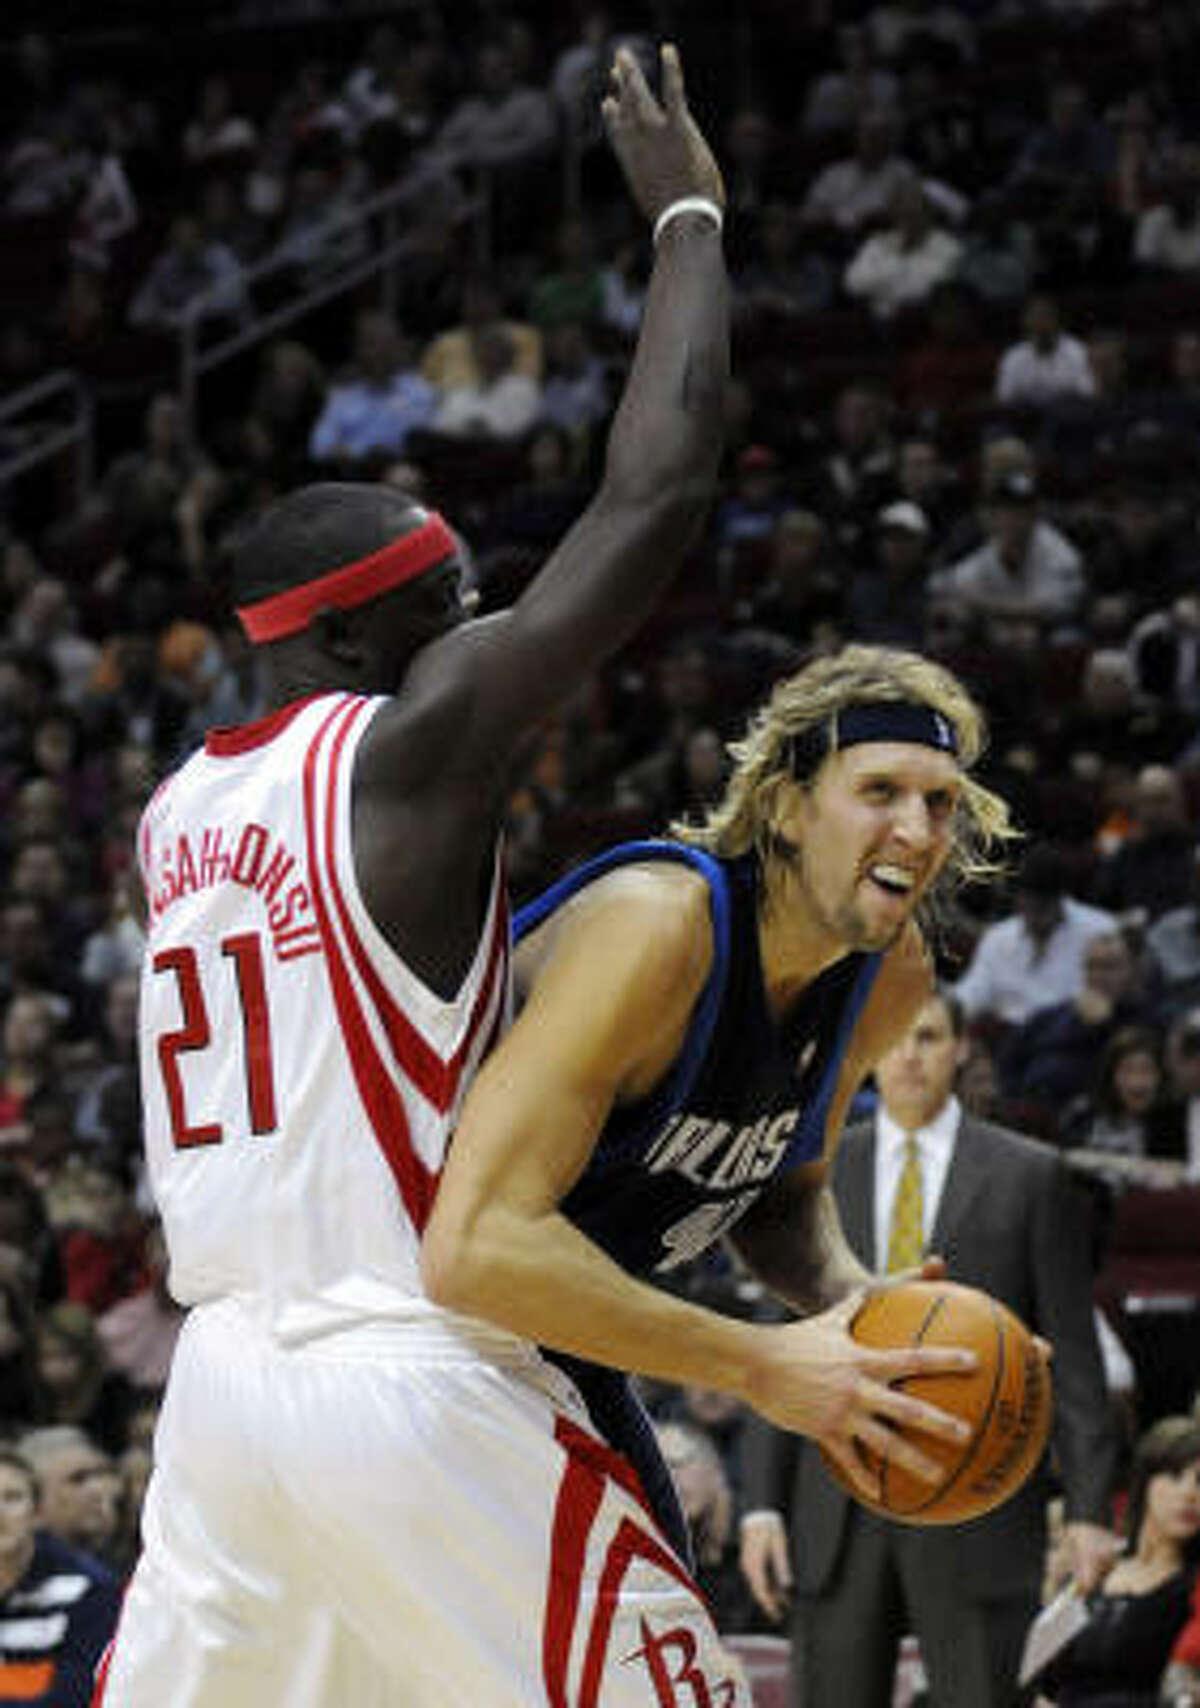 Mavericks forward Dirk Nowitzki, right, tries to get around Houston's Pops Mensah-Bonsu in the first half.